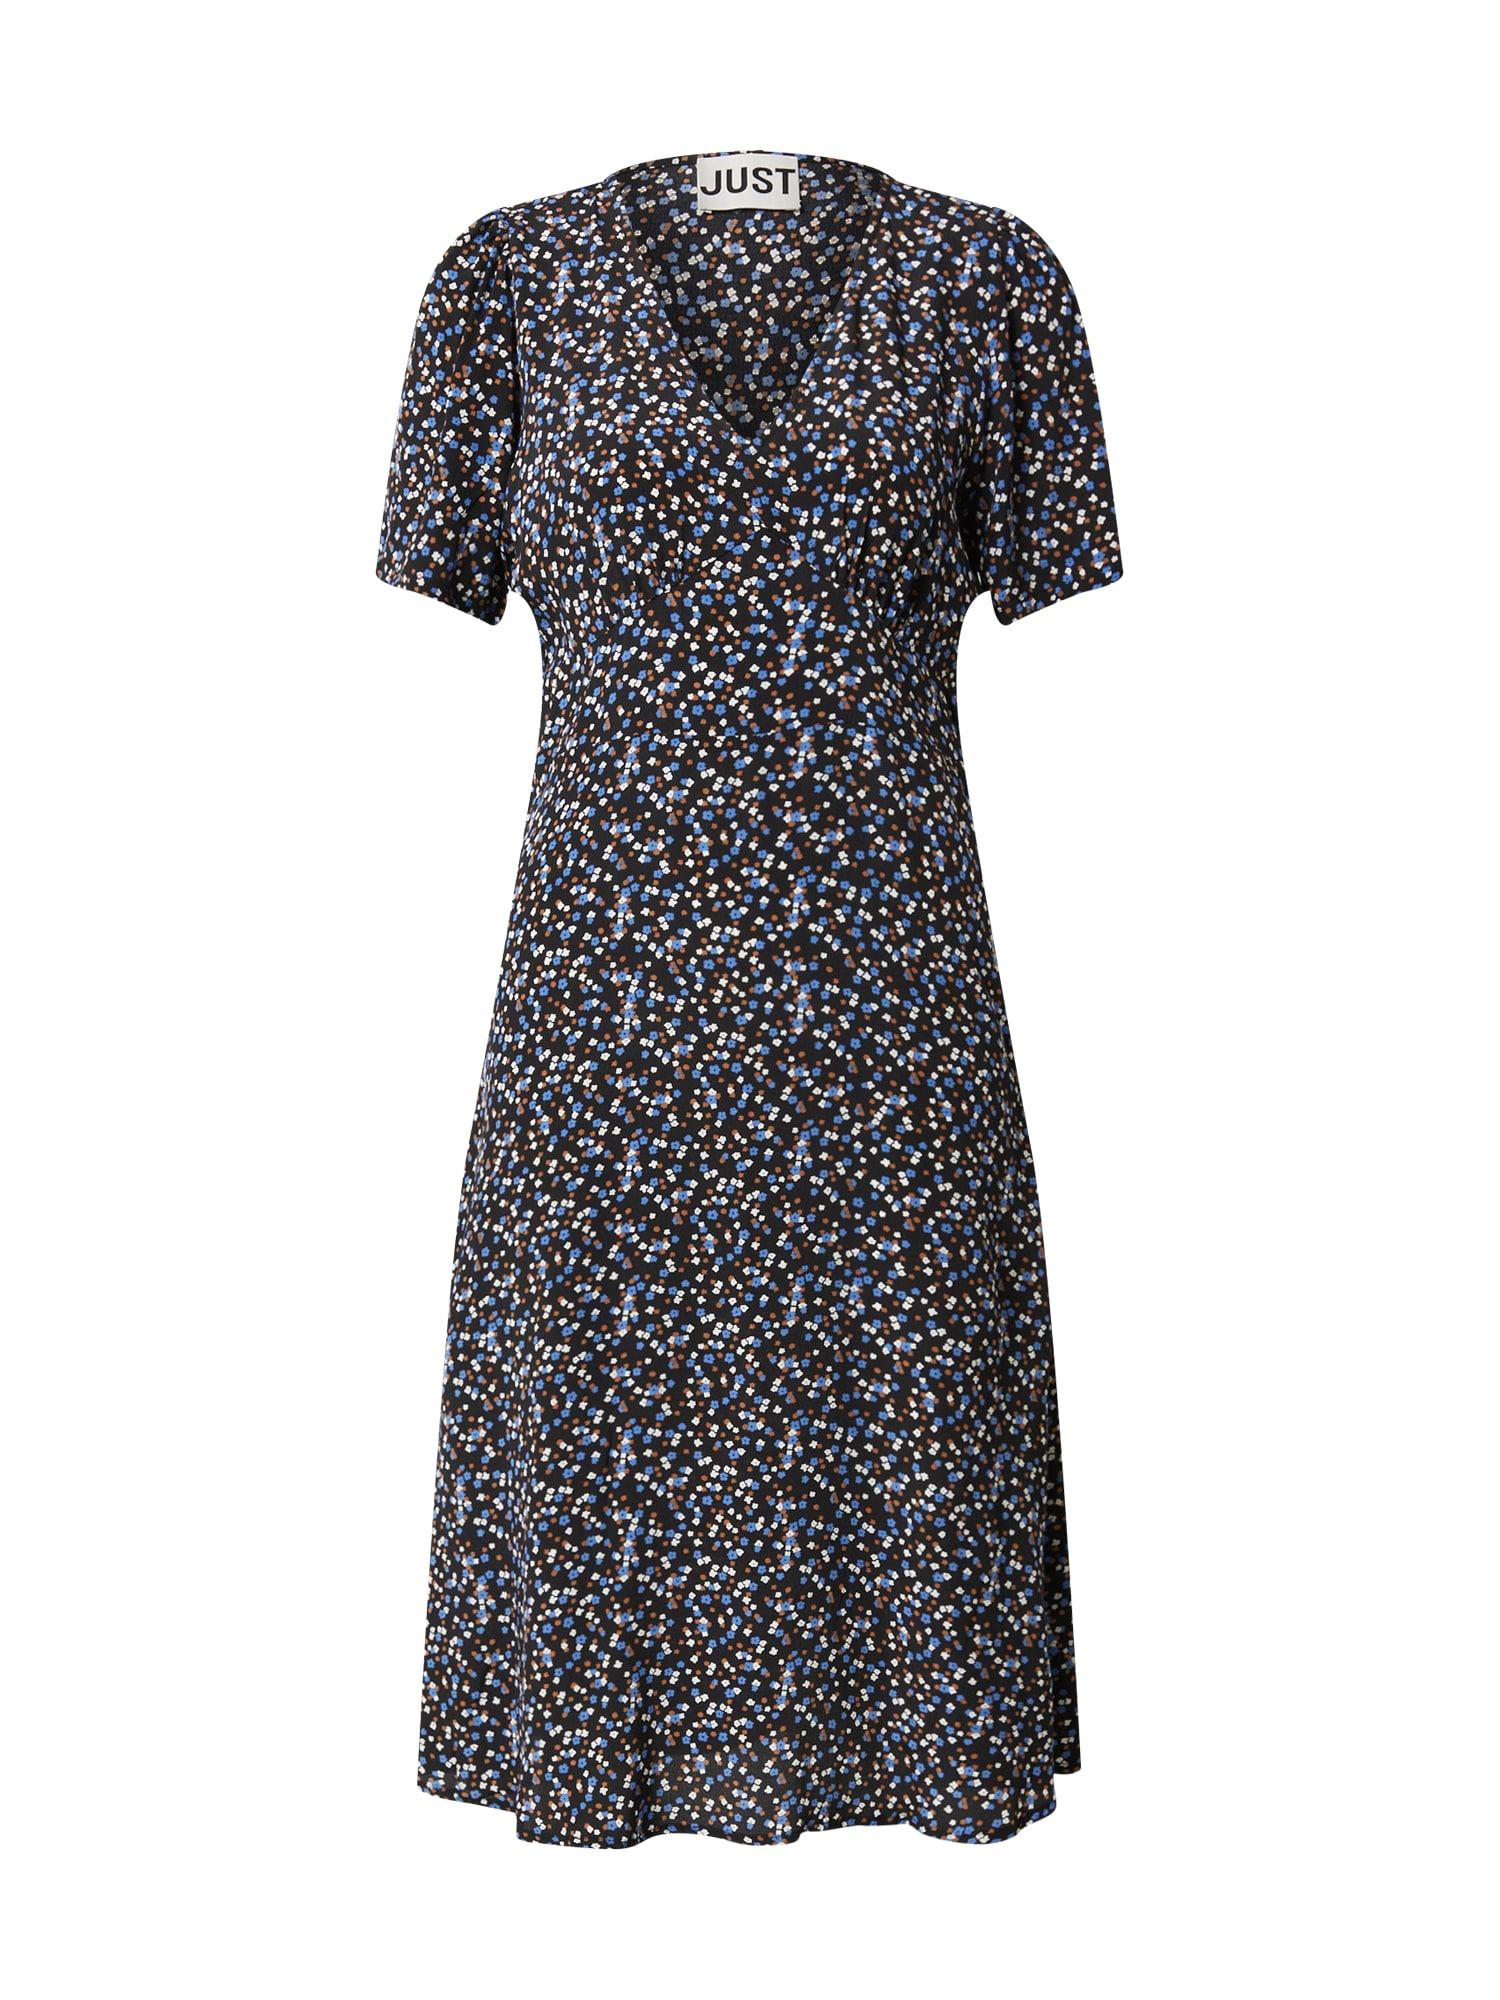 JUST FEMALE Šaty 'Lassy'  modré / čierna